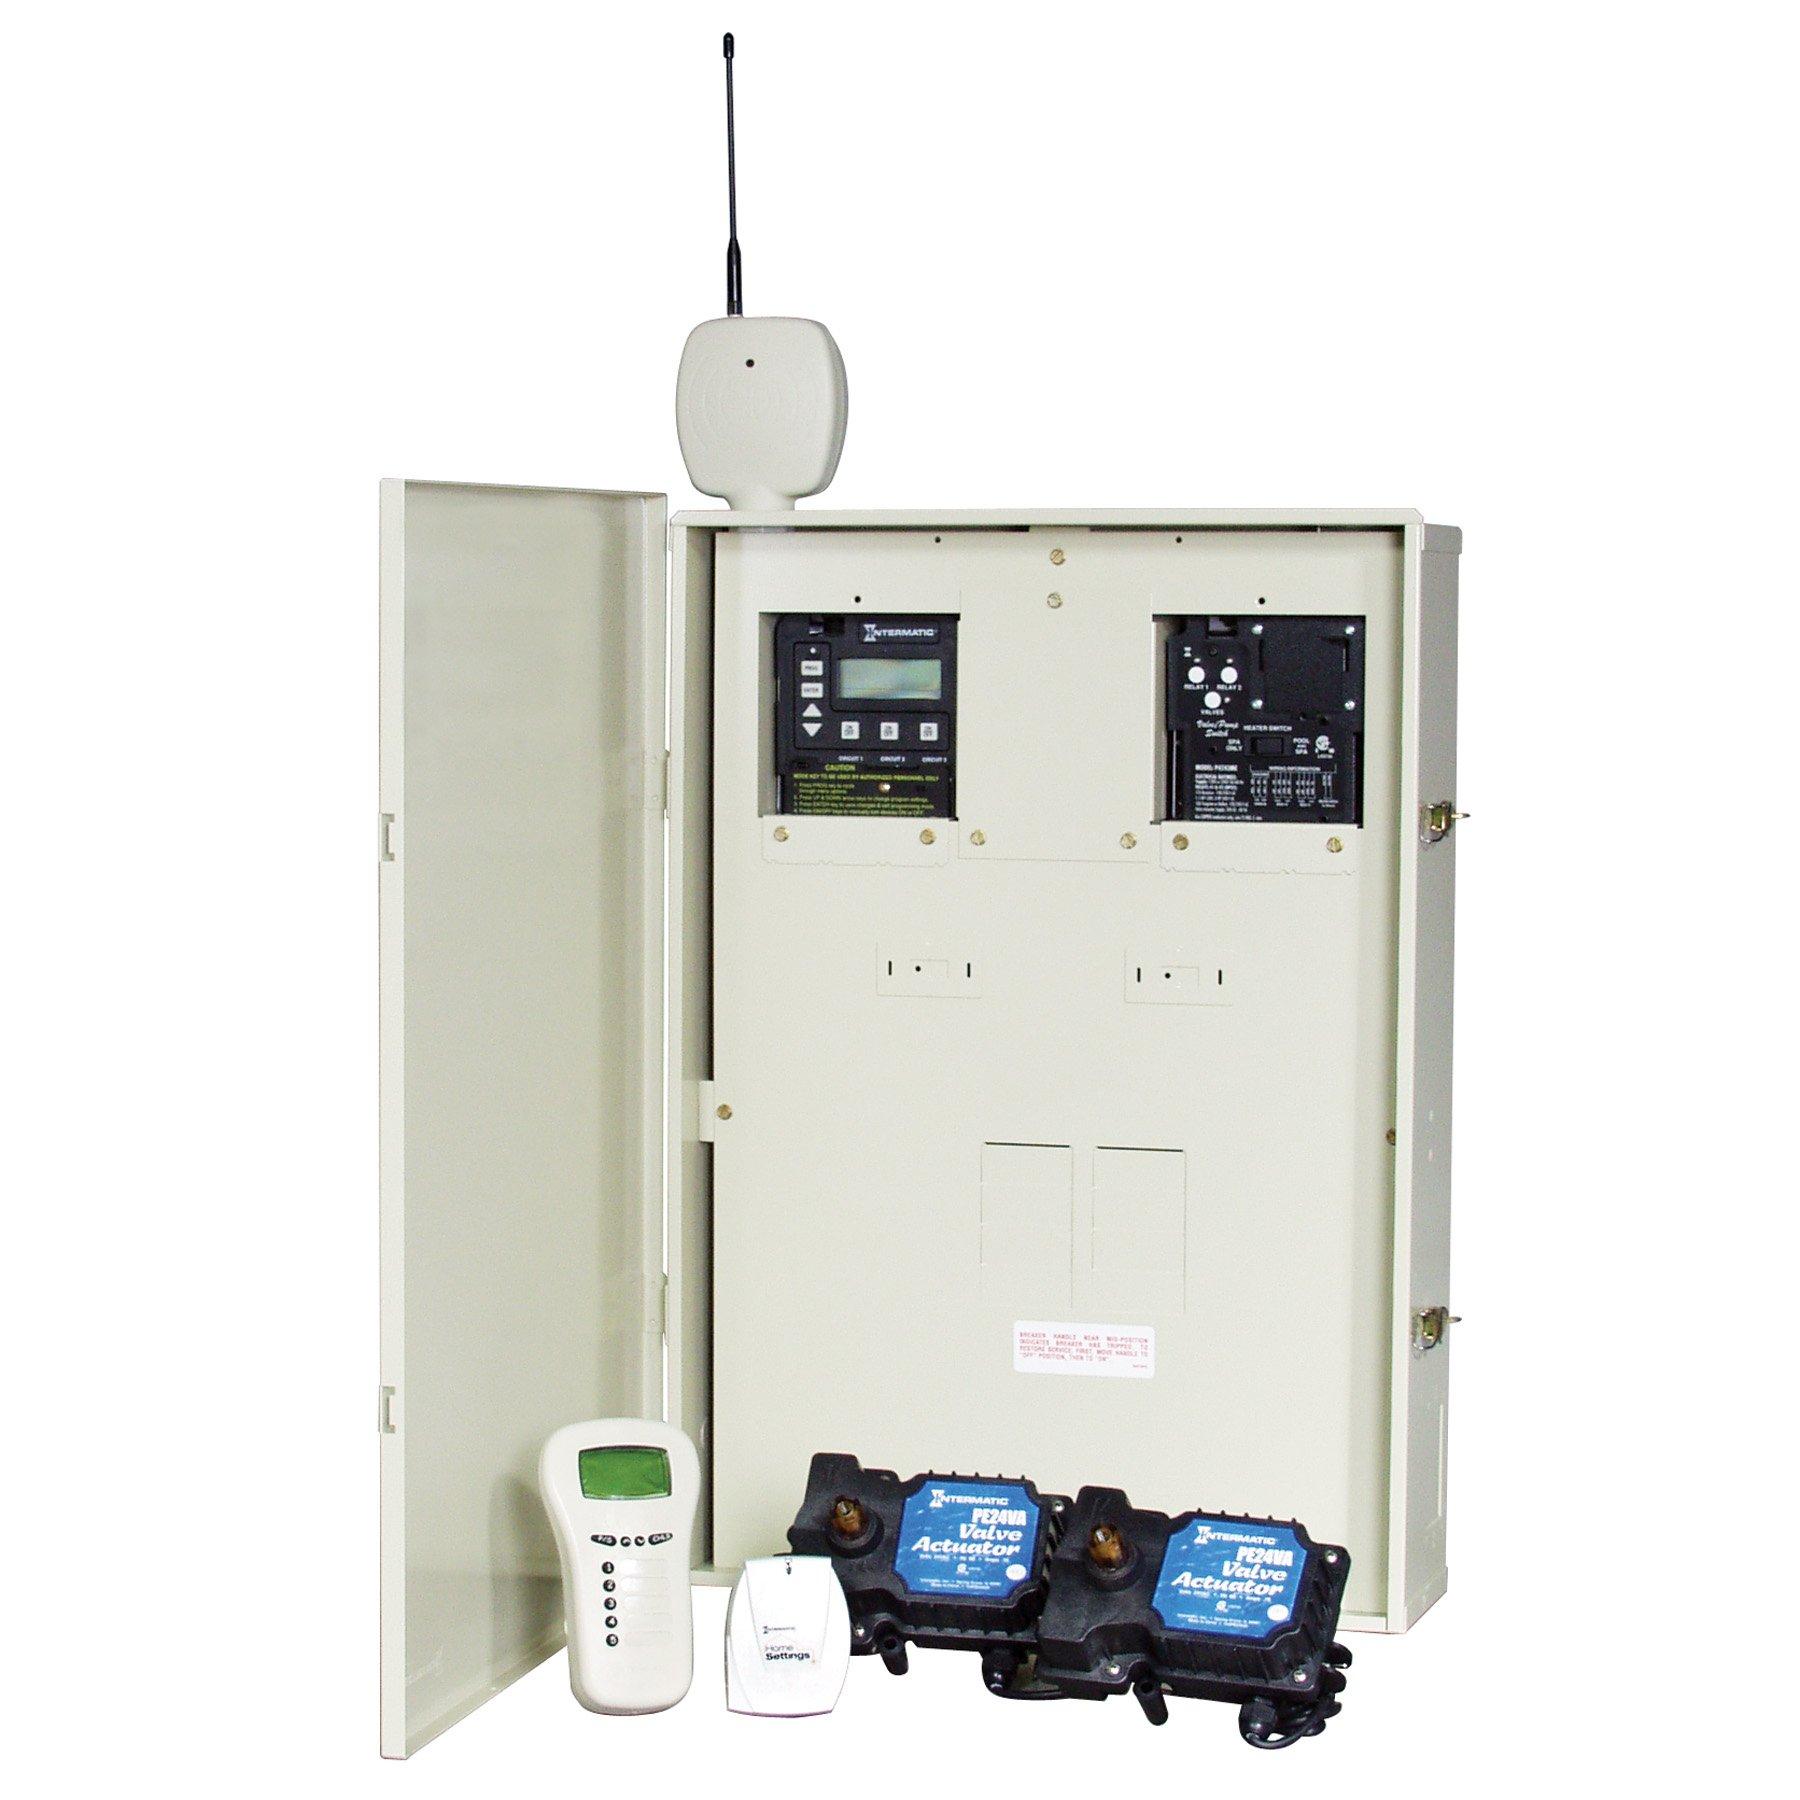 Intermatic PE45343RC I Wave Panel P1353ME/P4243ME/PE24V